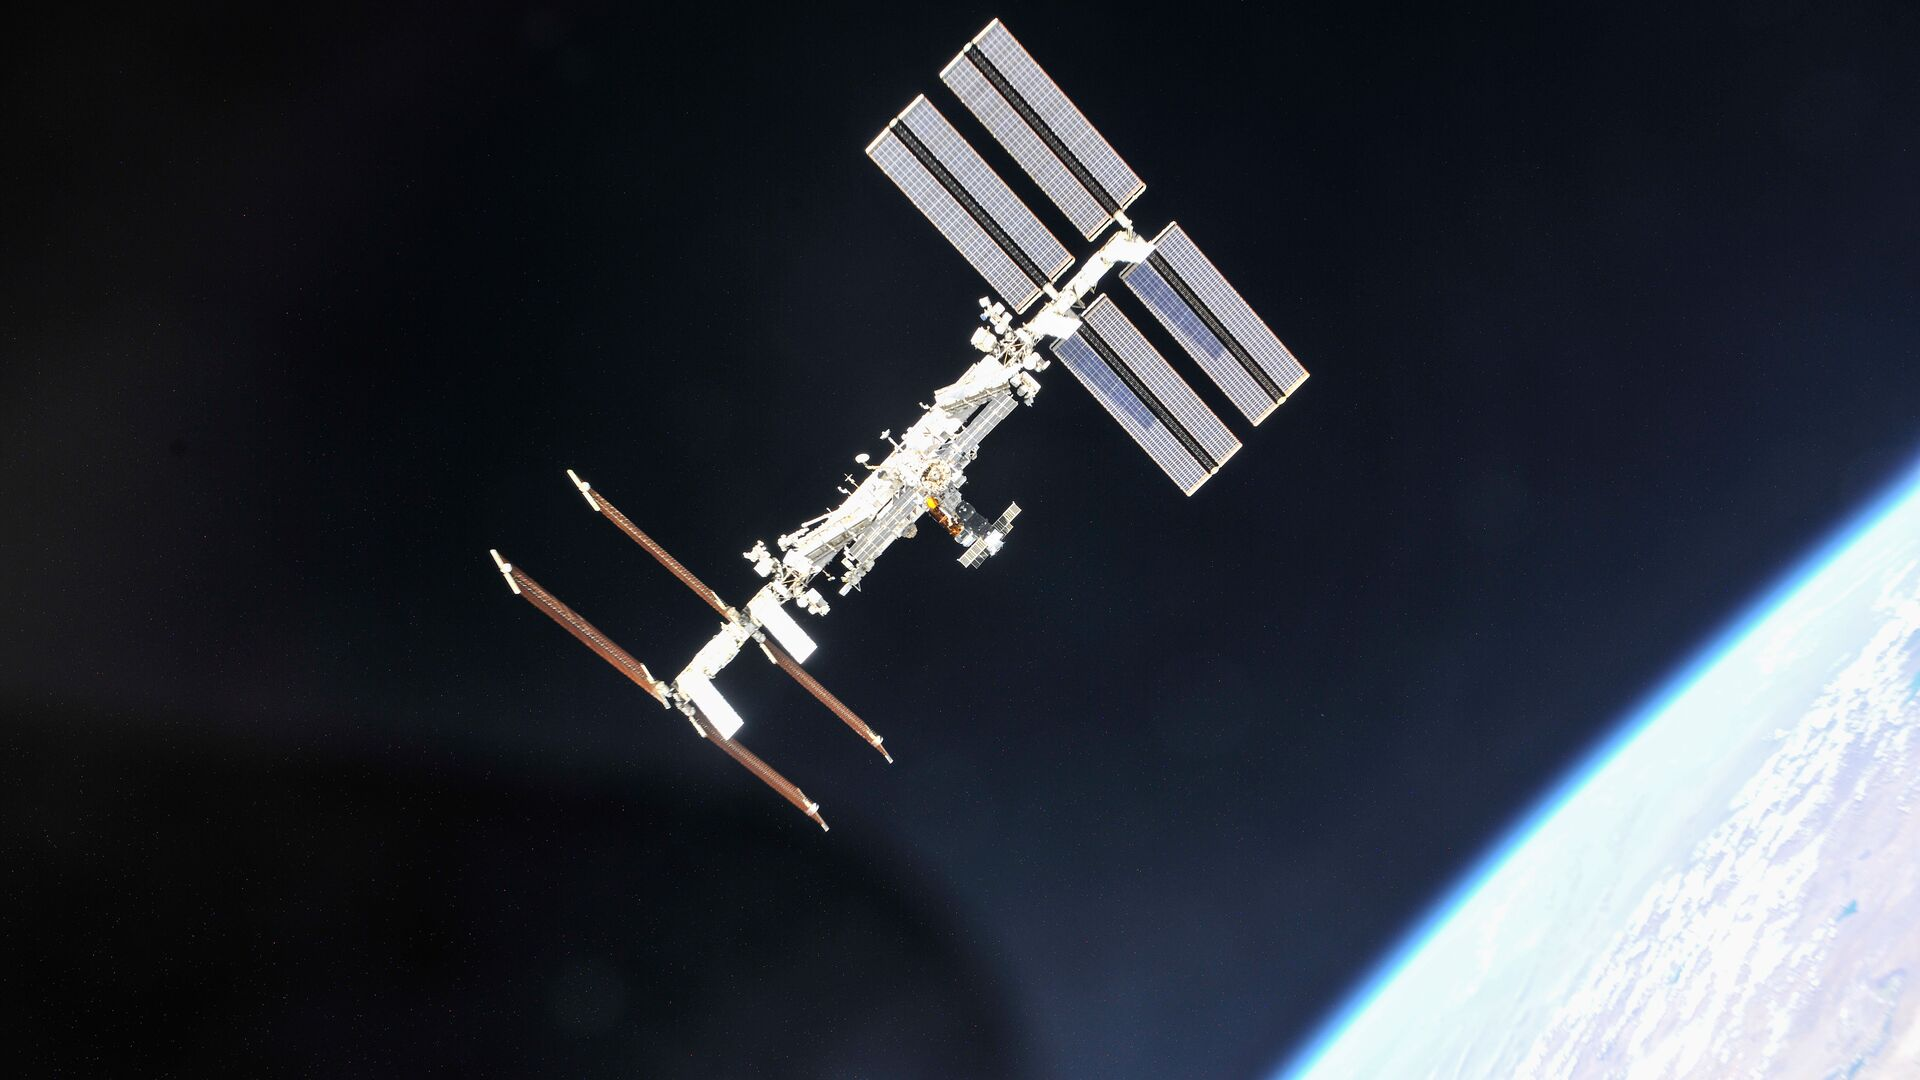 Estación Espacial Internacional (EEI)  - Sputnik Mundo, 1920, 10.03.2021